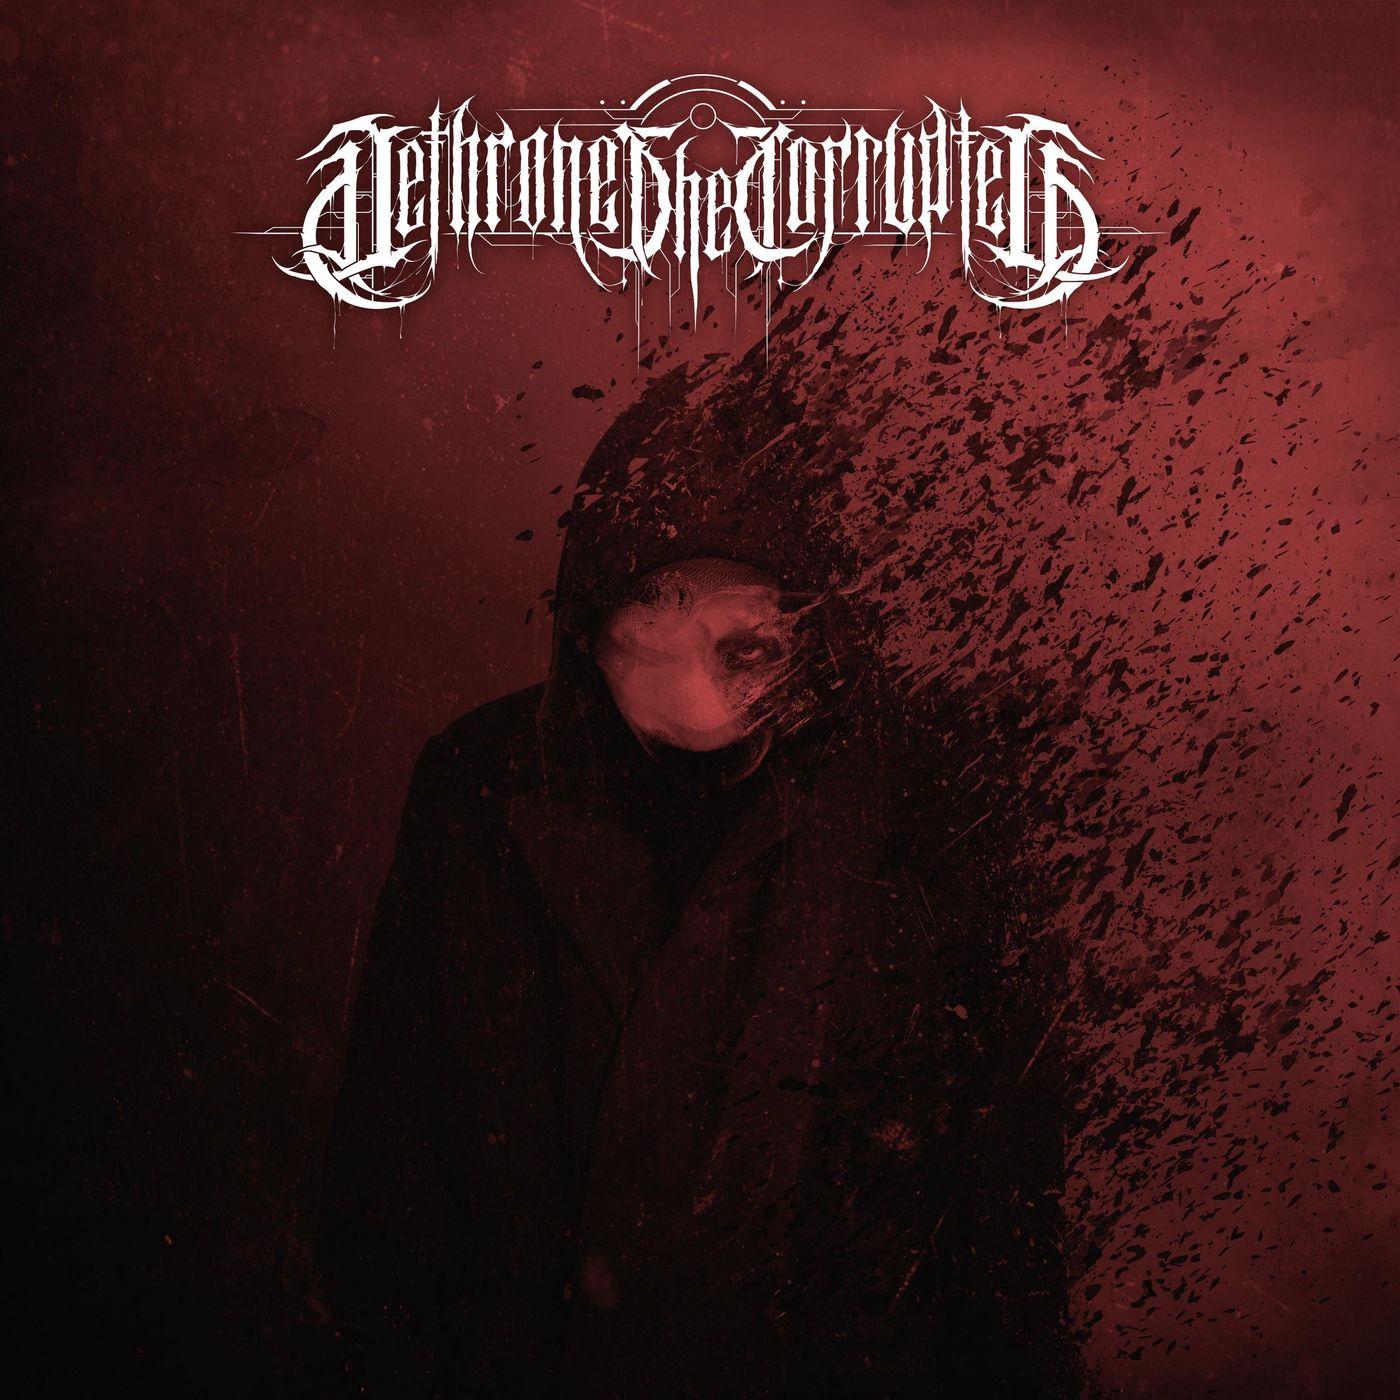 Dethrone the Corrupted - Art & Severance [single] (2020)